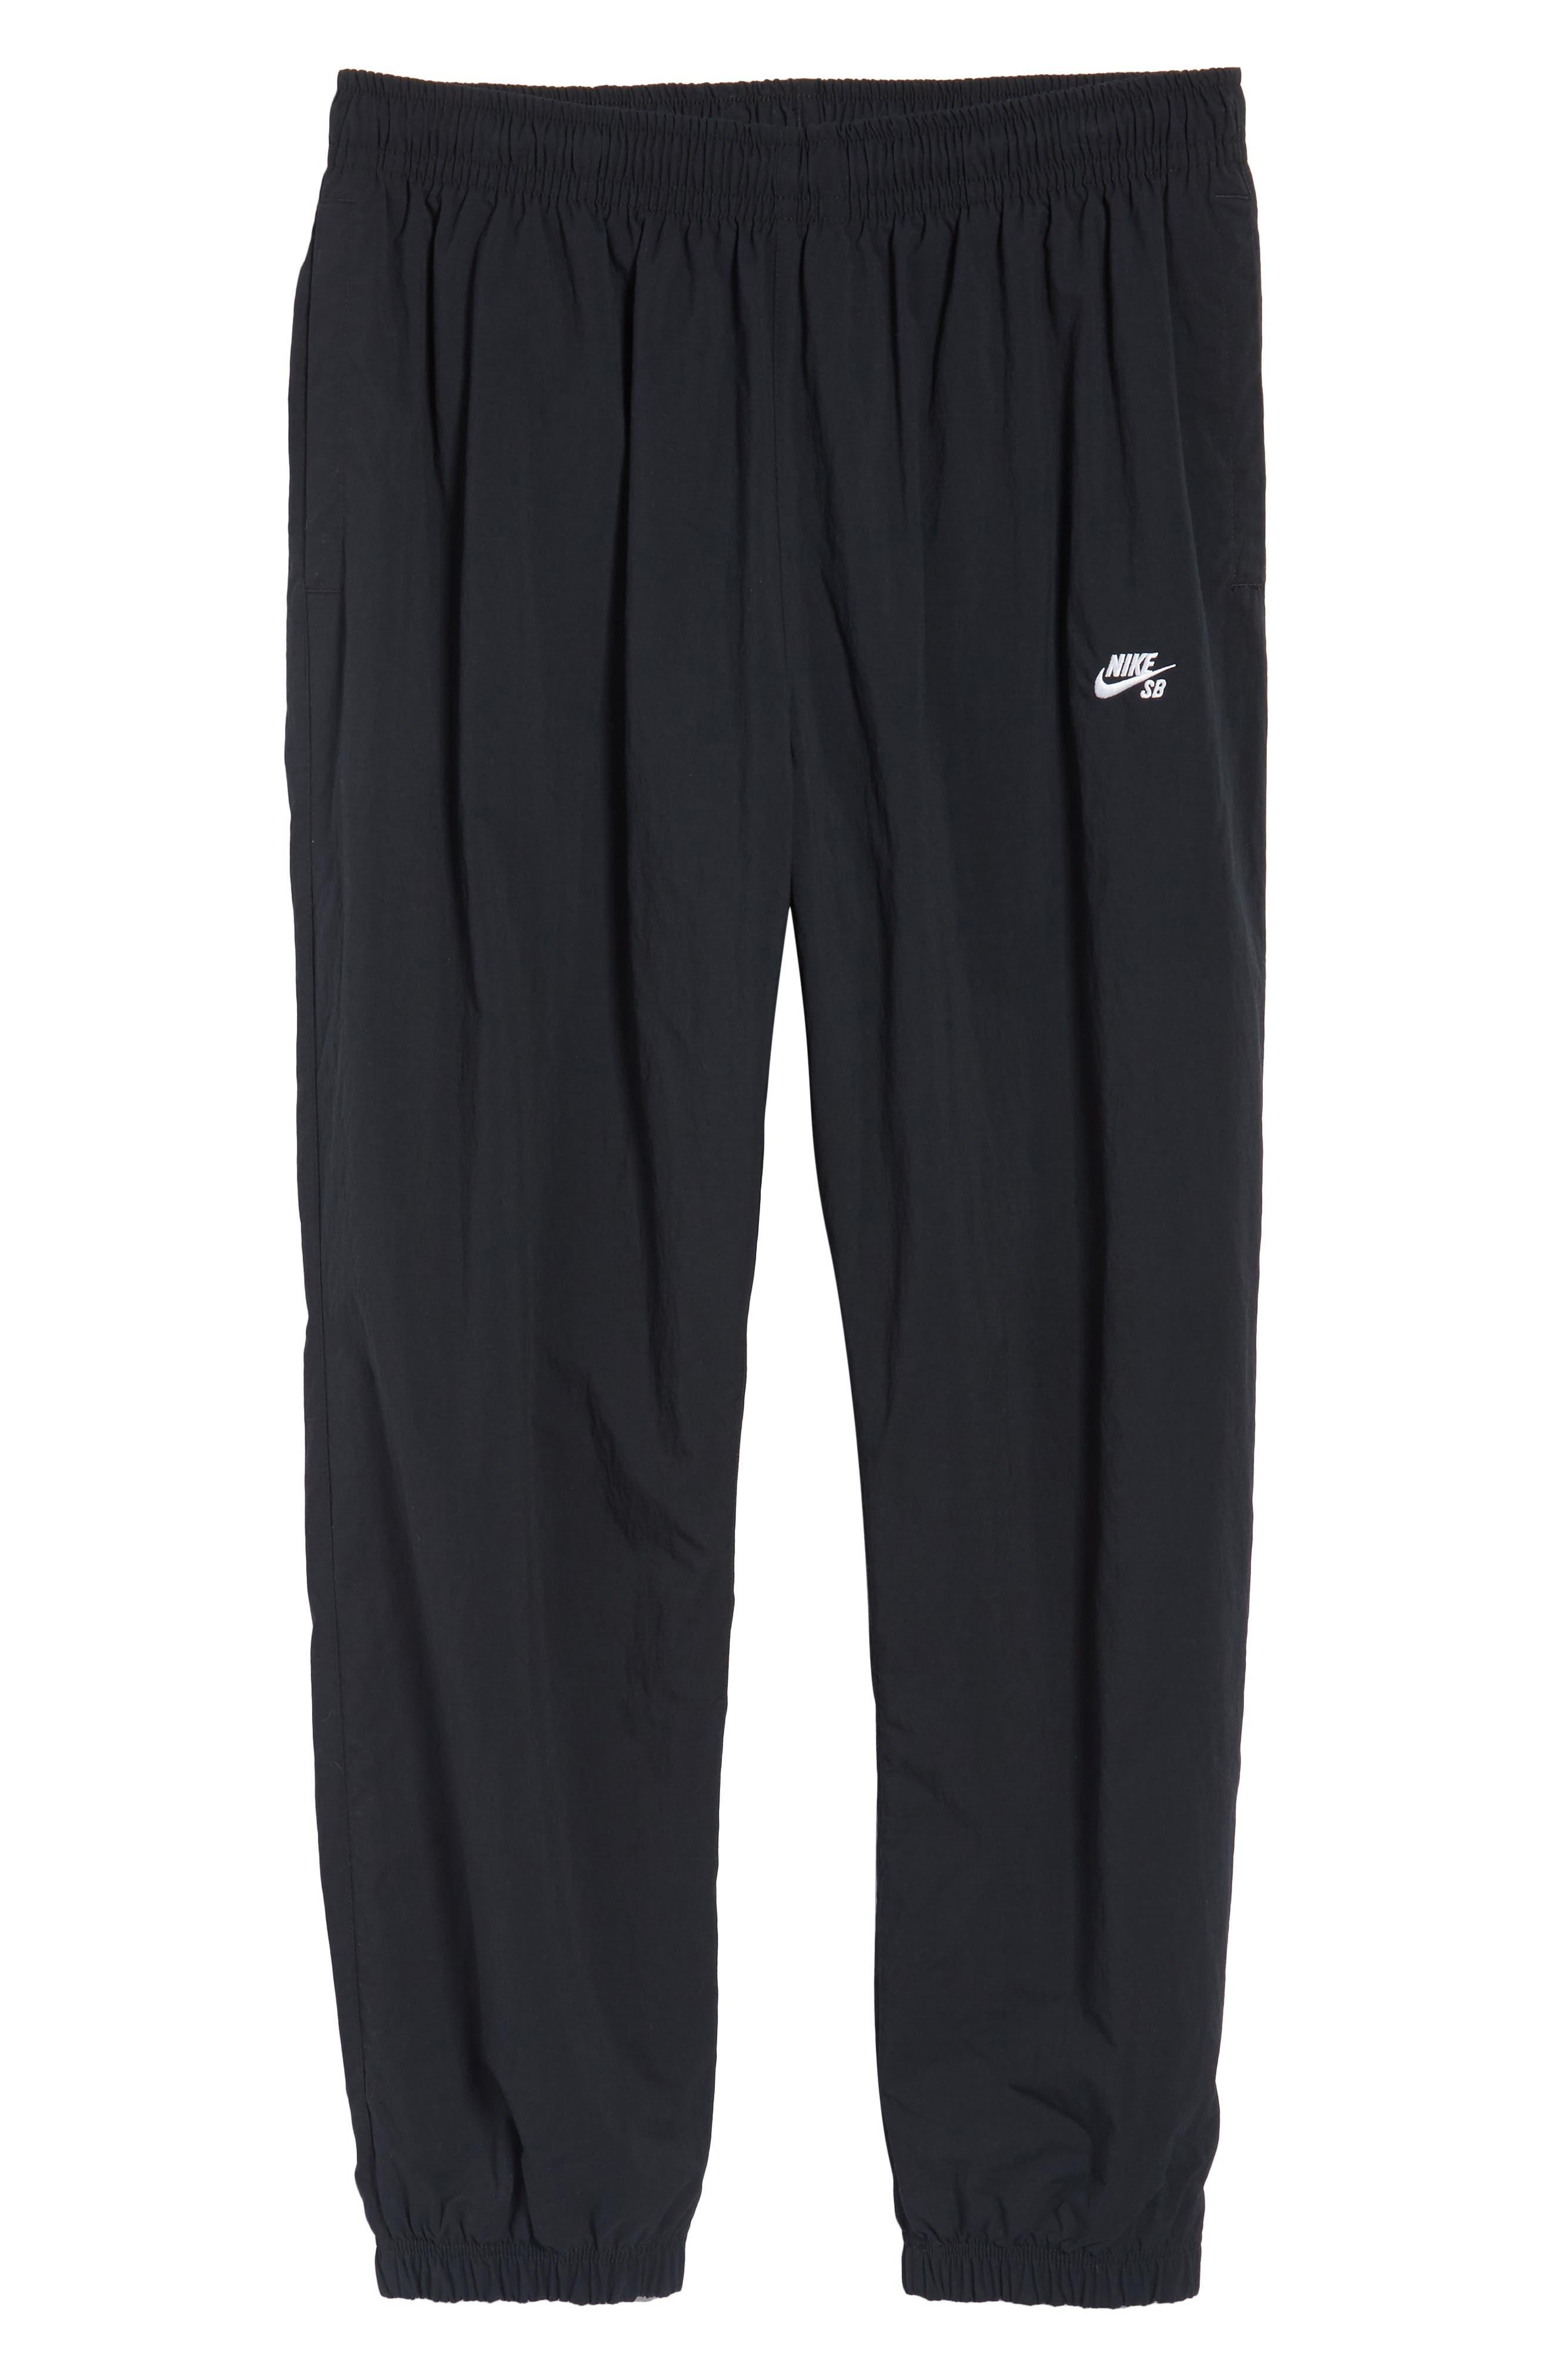 Flex Woven Pants,                             Alternate thumbnail 6, color,                             Black/ White